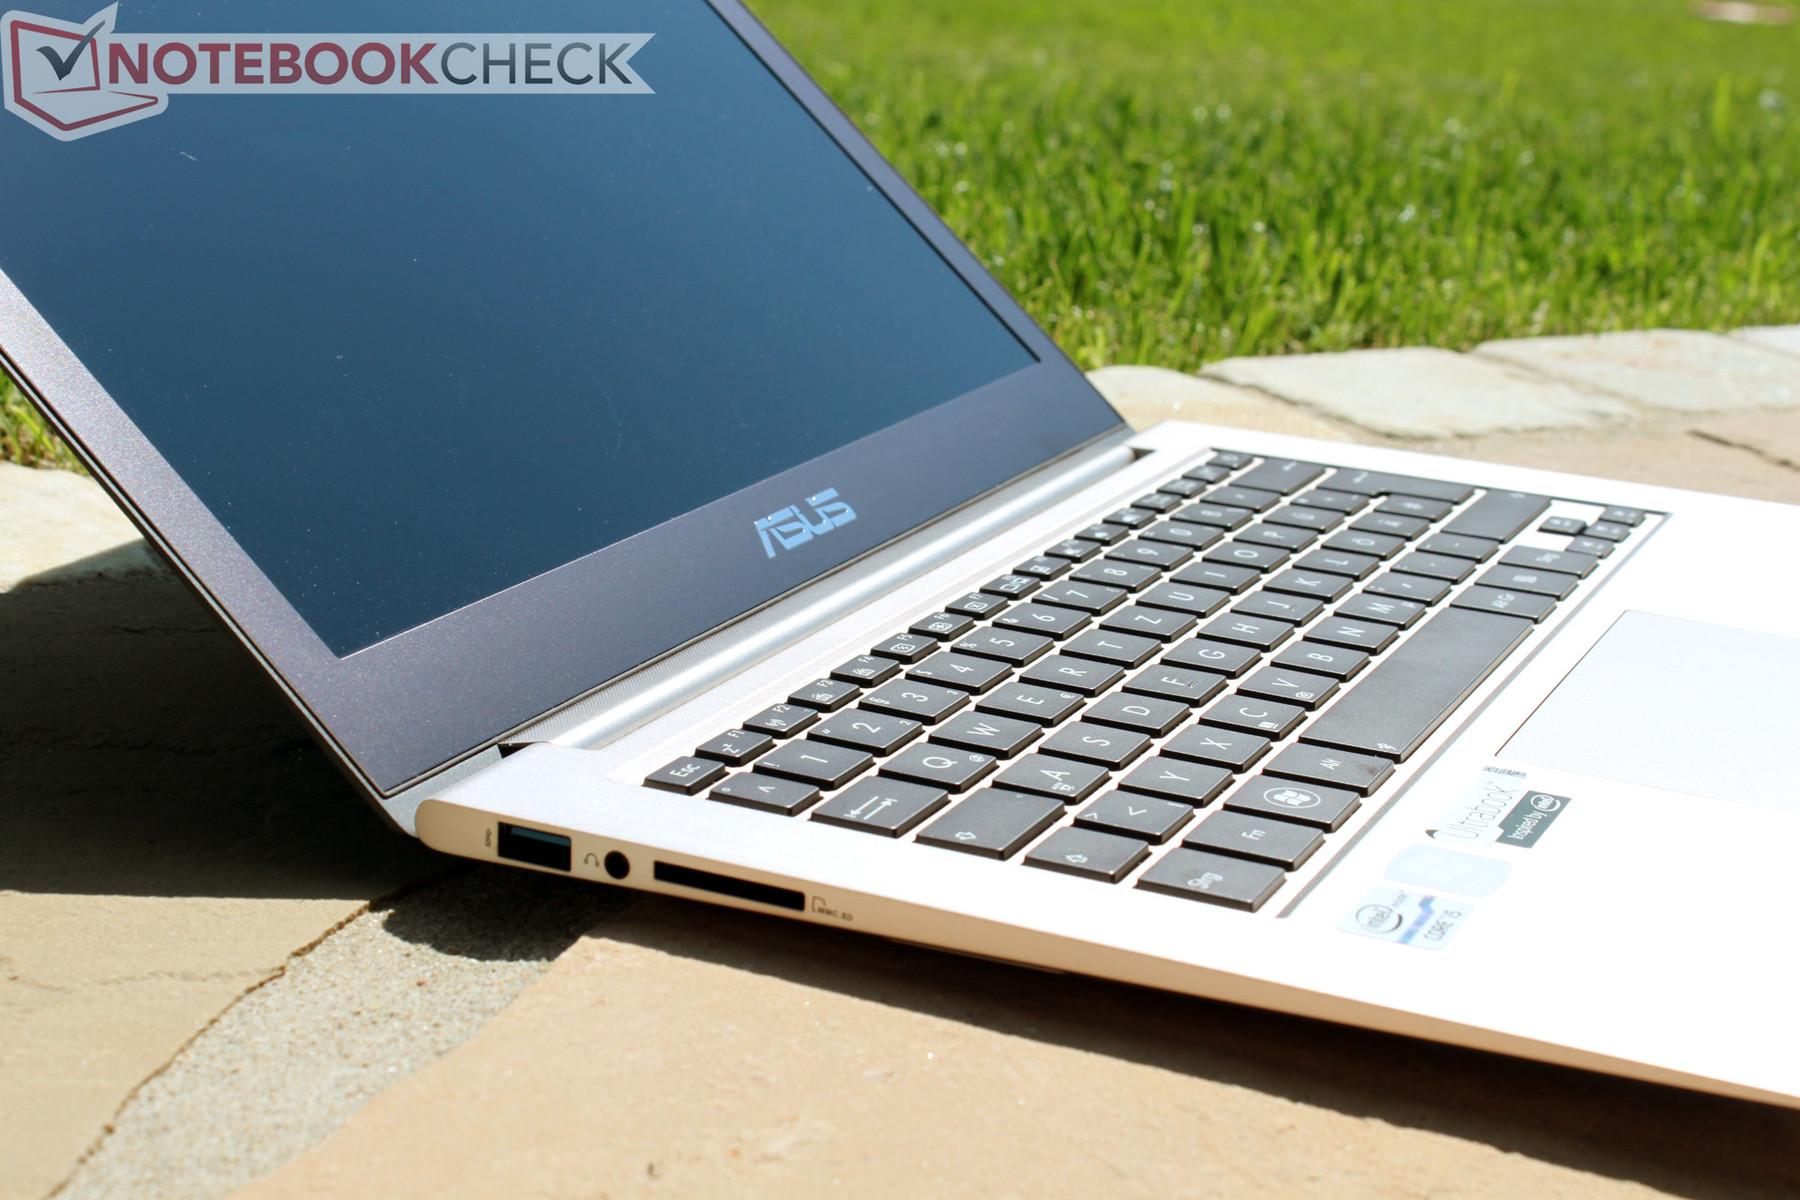 Test Asus Zenbook Prime UX31A Ultrabook